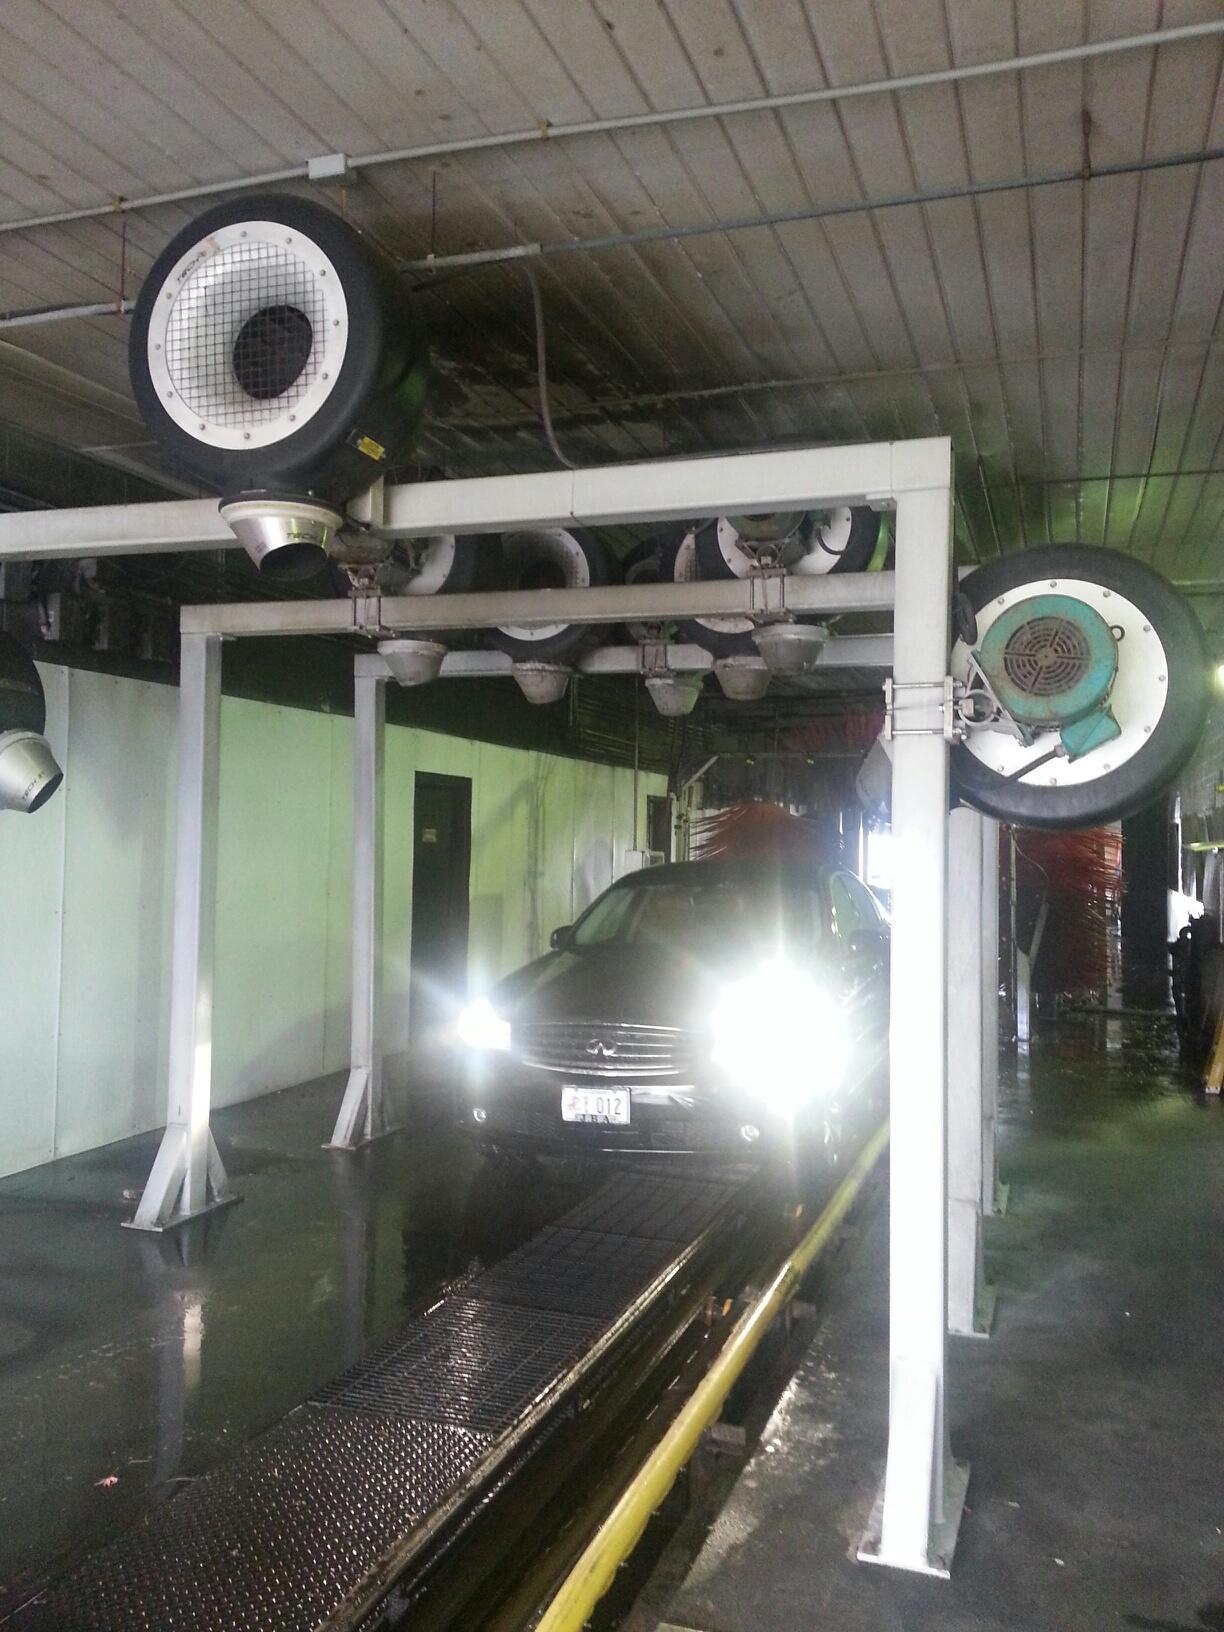 Full Service Car Wash.jpg